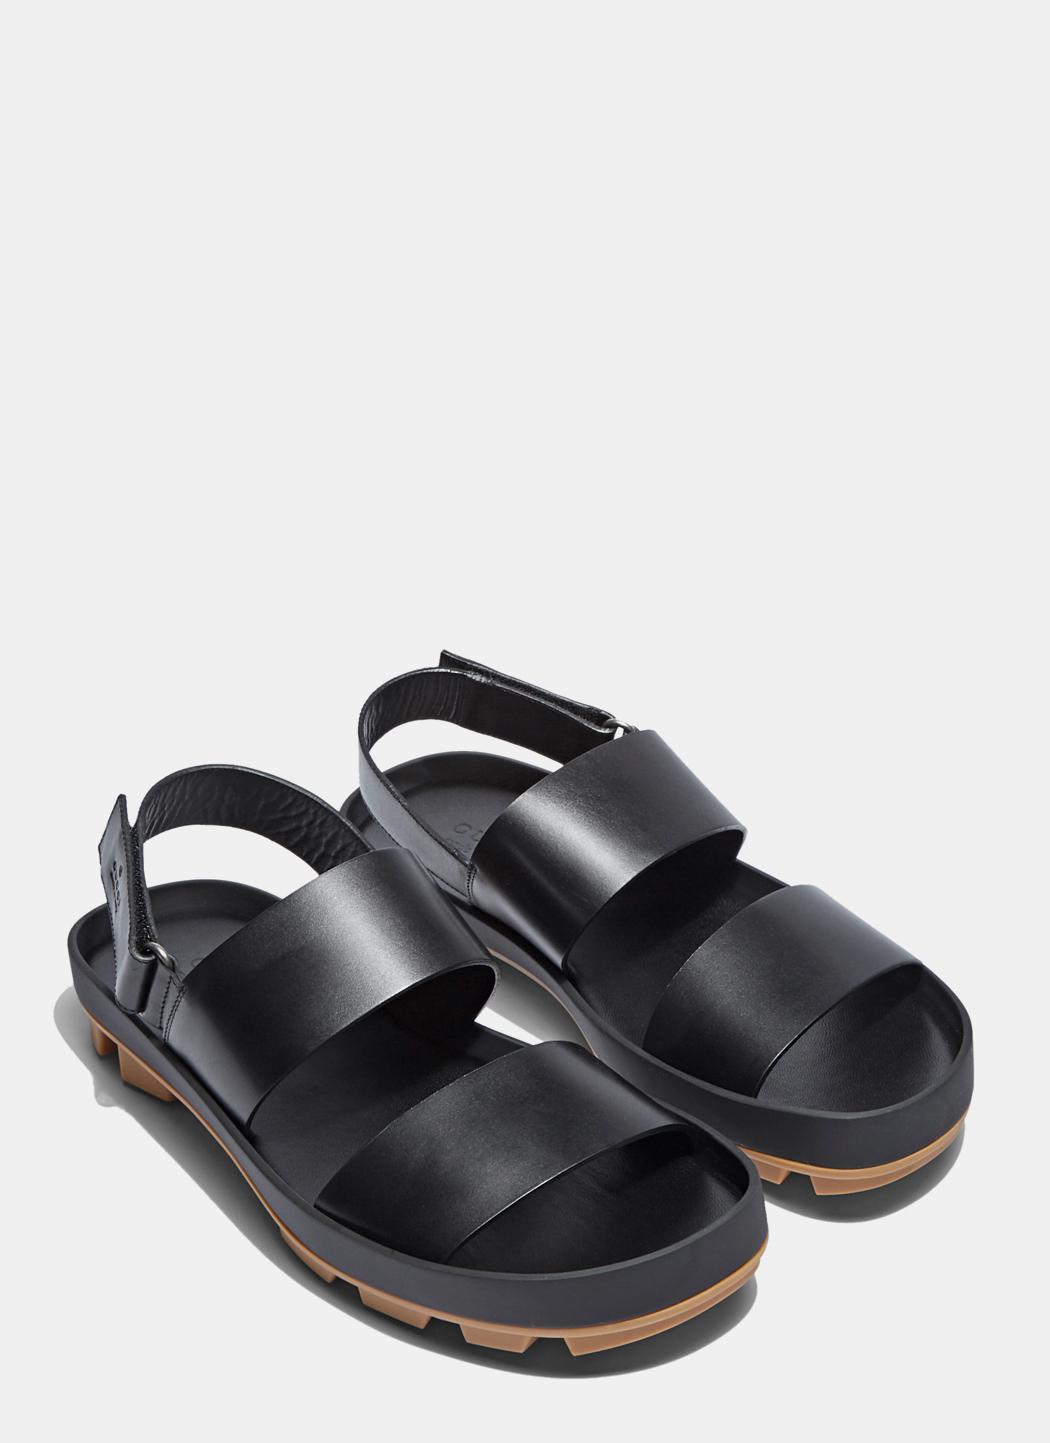 8812d7bcf1218d gucci mens gucci rubber buckle strap sandals reebonz cozy fresh 6fb4d aee82